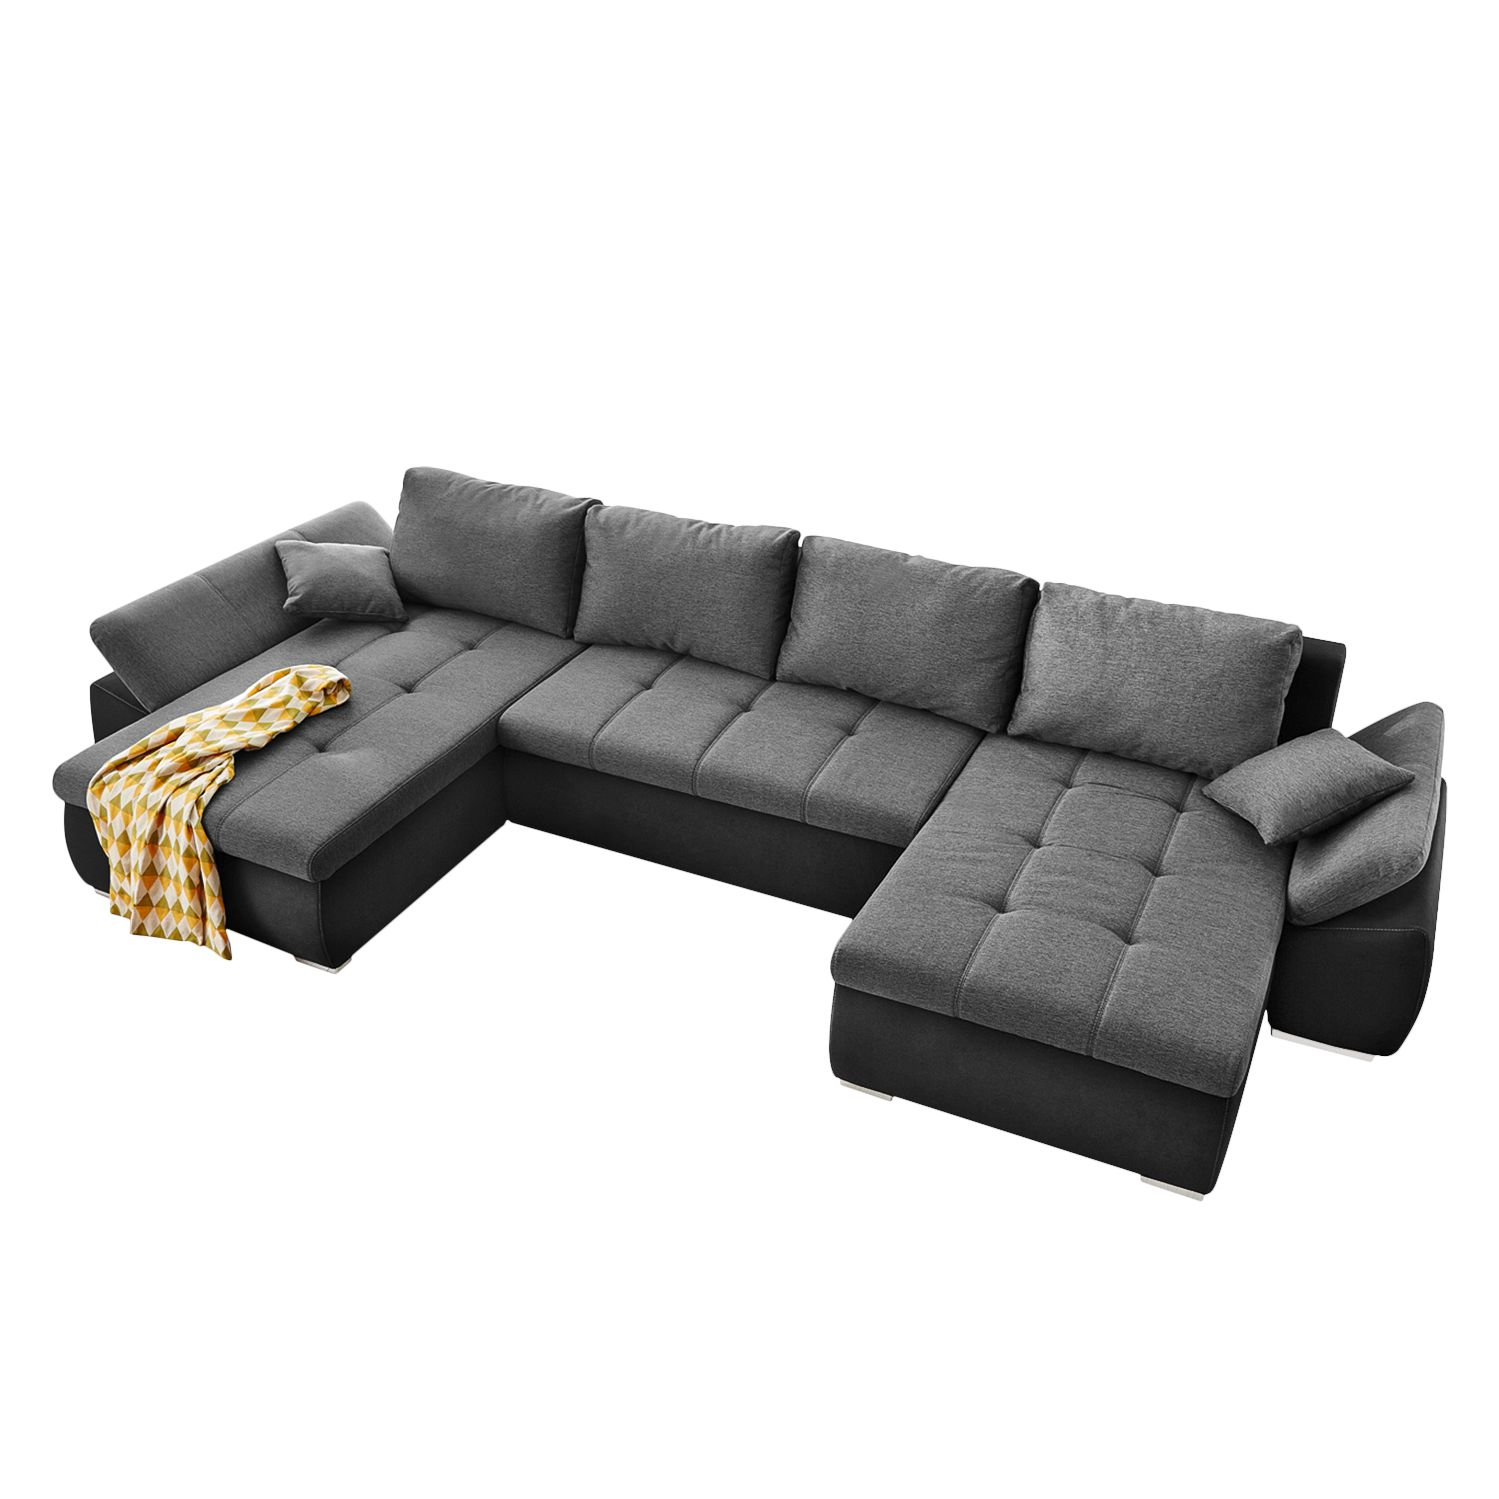 wohnlandschaft mit schlaffunktion wohnlandschaft u form. Black Bedroom Furniture Sets. Home Design Ideas